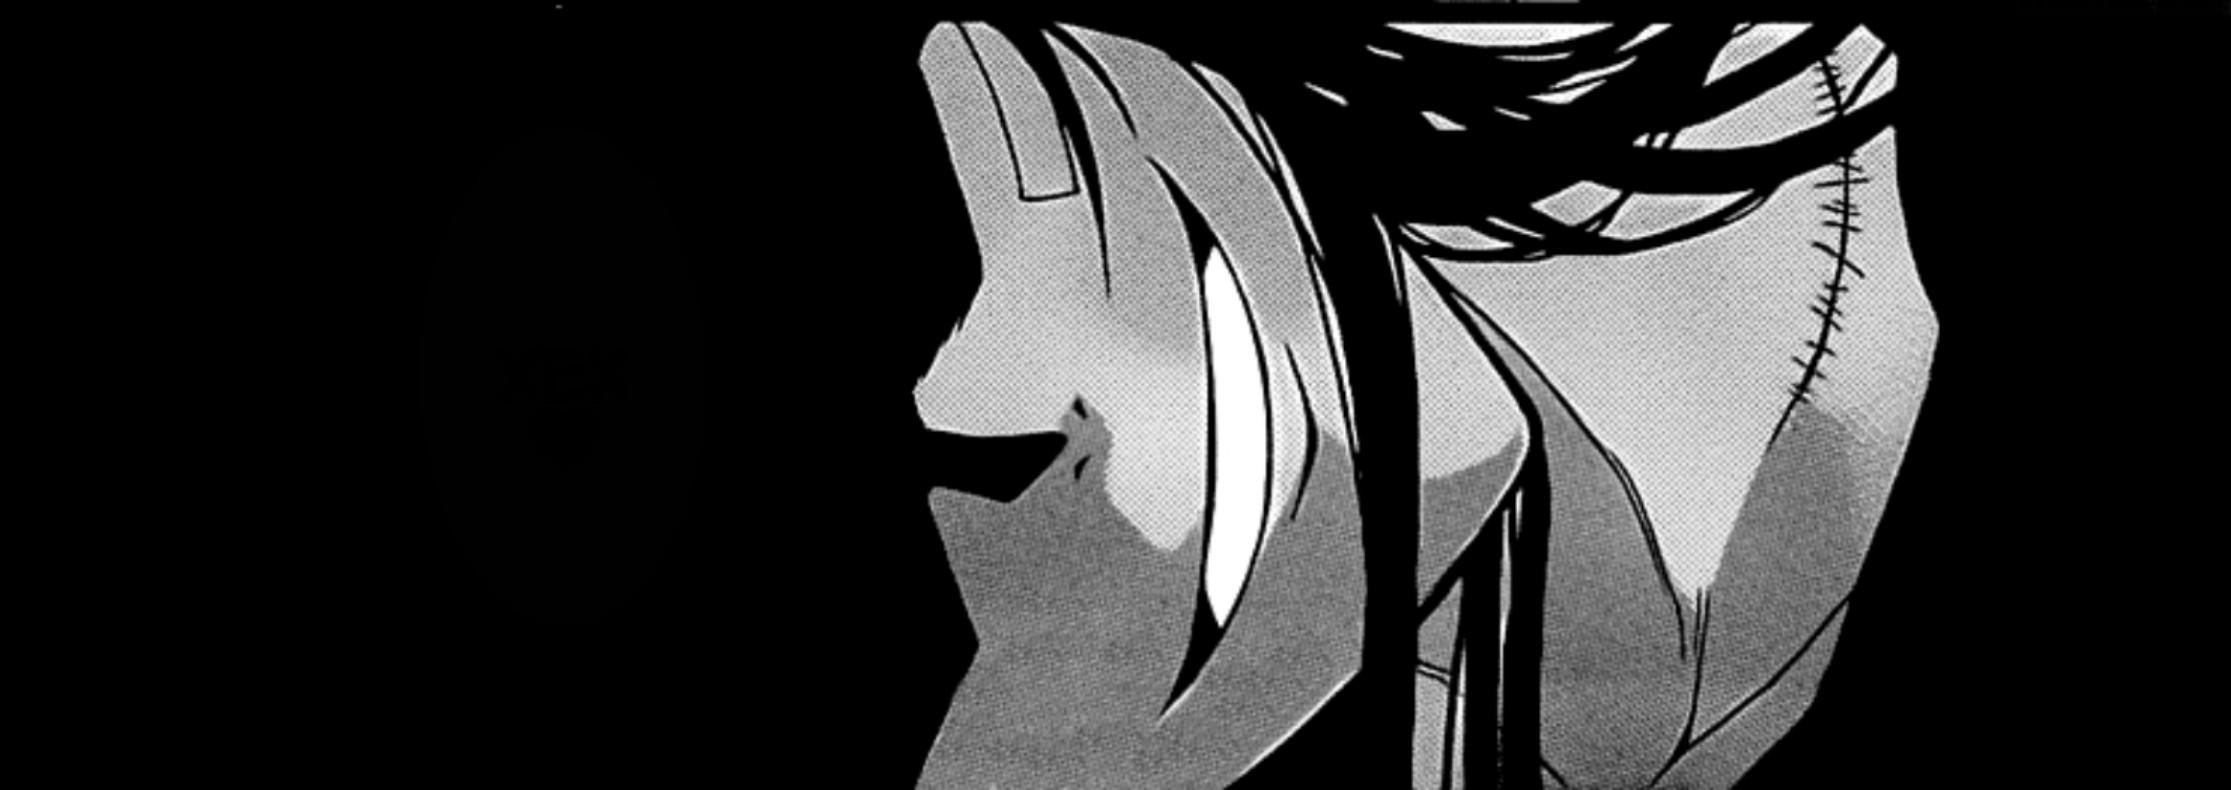 Drawing Black Illustration Monochrome Murcielago Manga Darkness Wing Arm Sketch Black And White Monochrome Photography